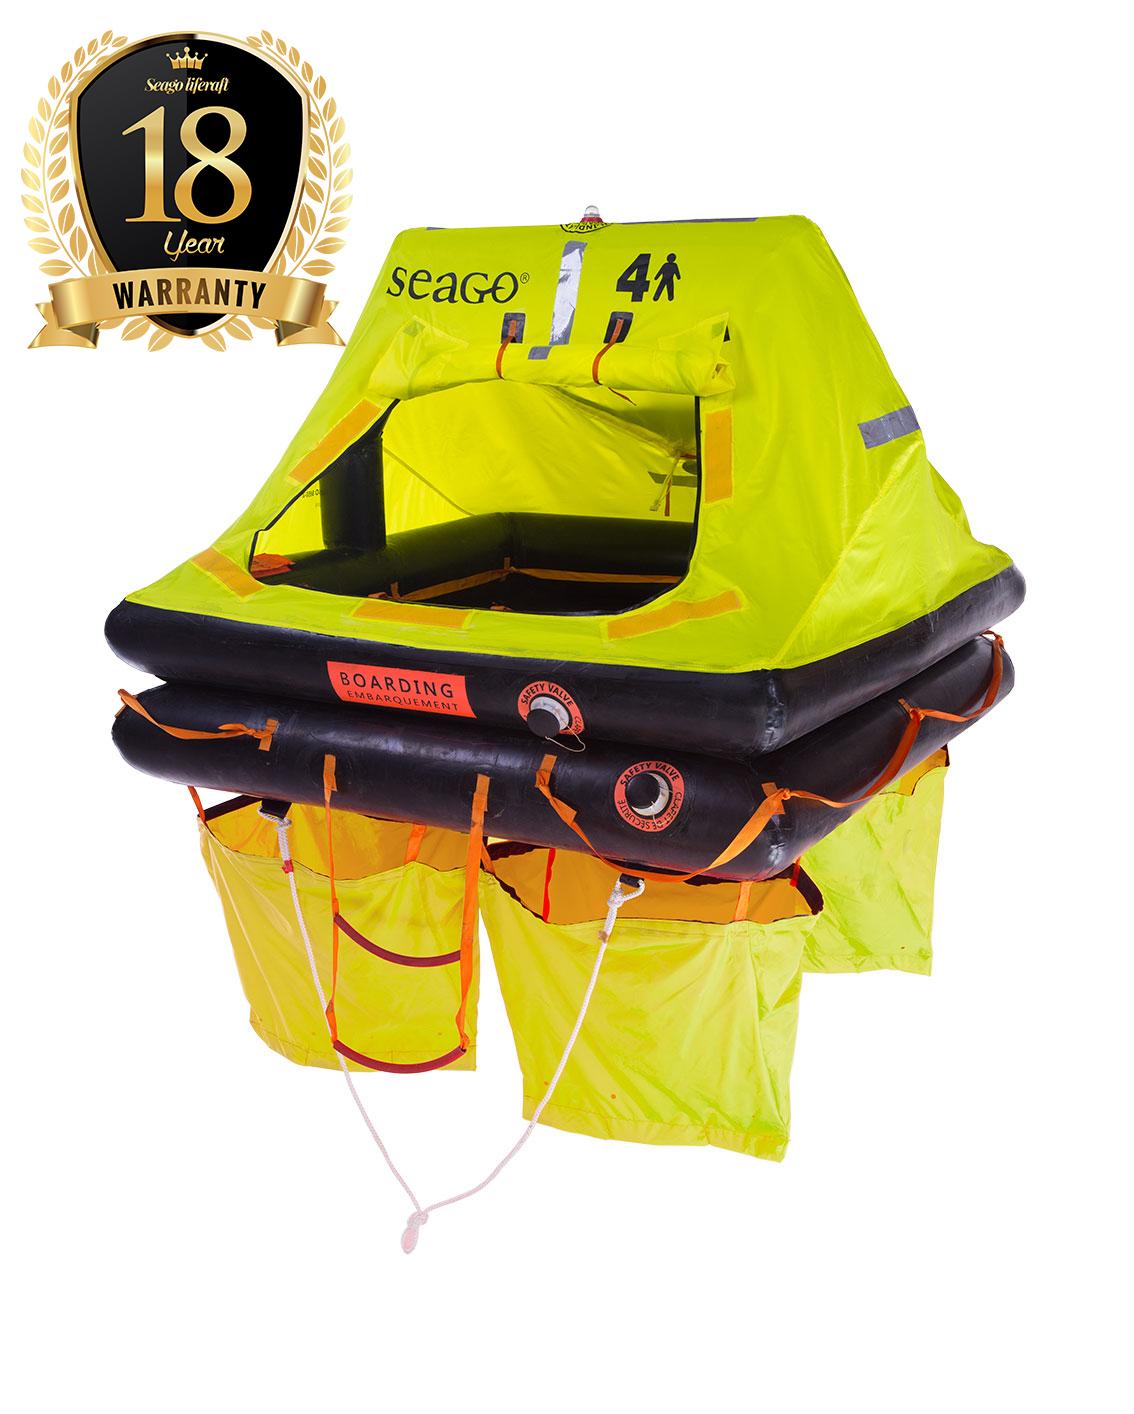 Sea Cruiser ISO 9650-2 Liferaft - Seago